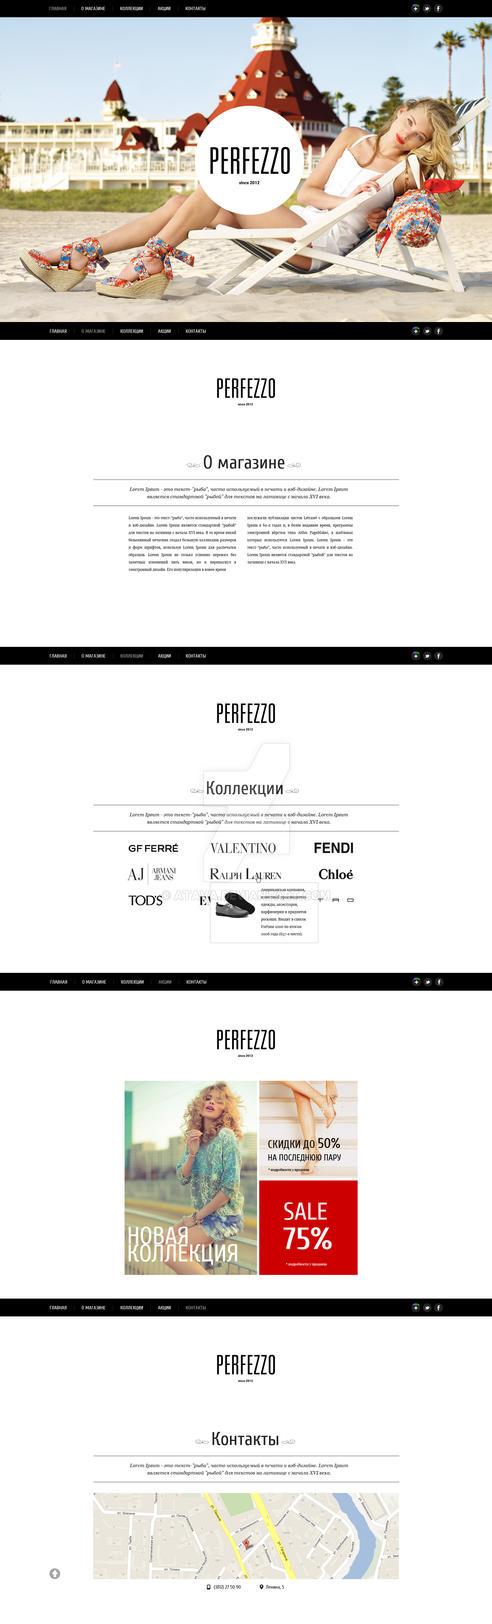 Perfezzo (shoe store) by Atava